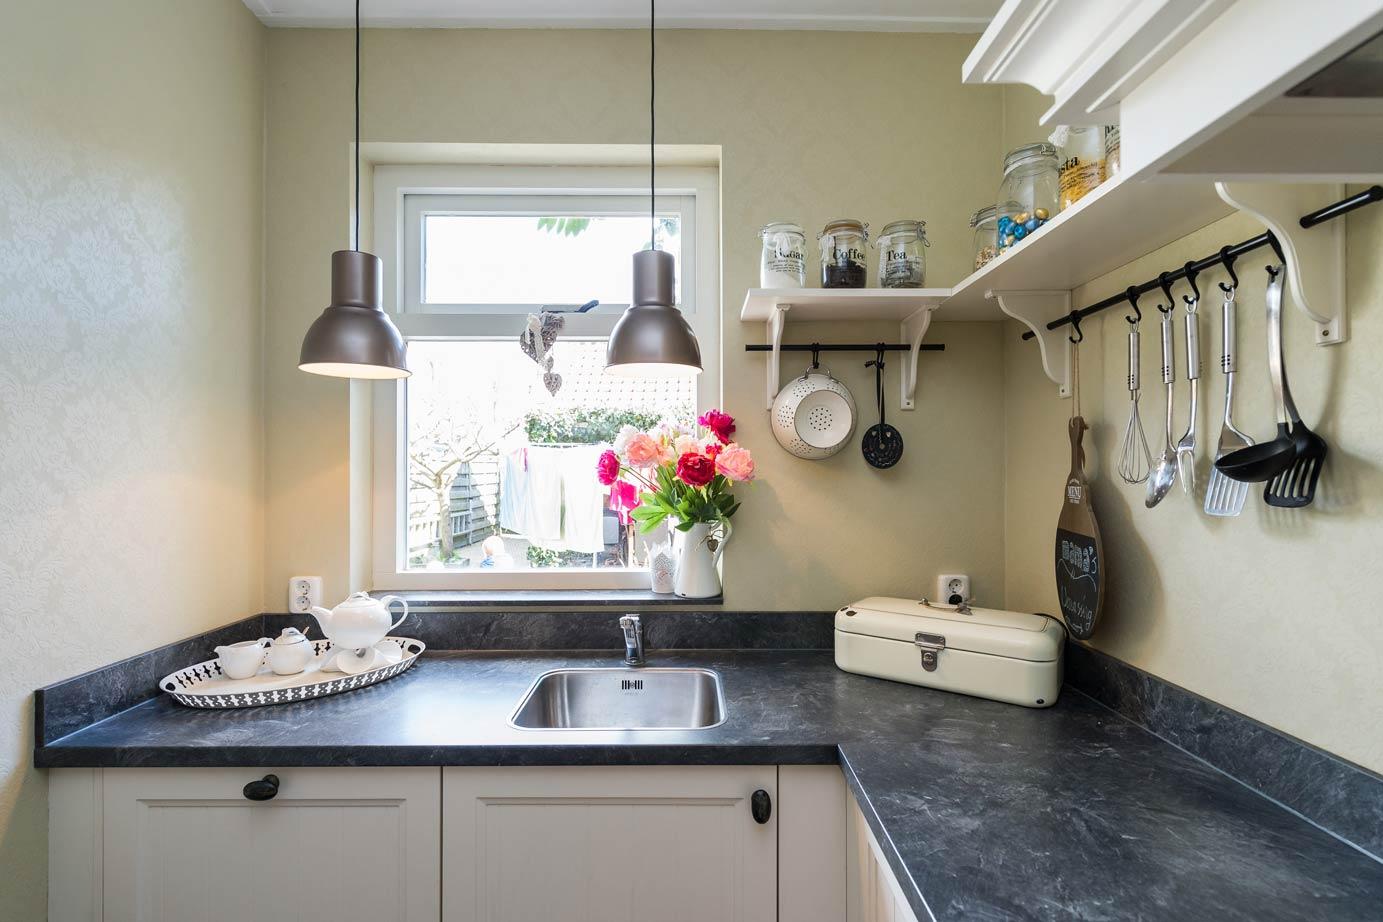 Spoelbak Keuken Kopen : Landelijke keuken kopen in Middelharnis? Lees klantervaring – Ardi